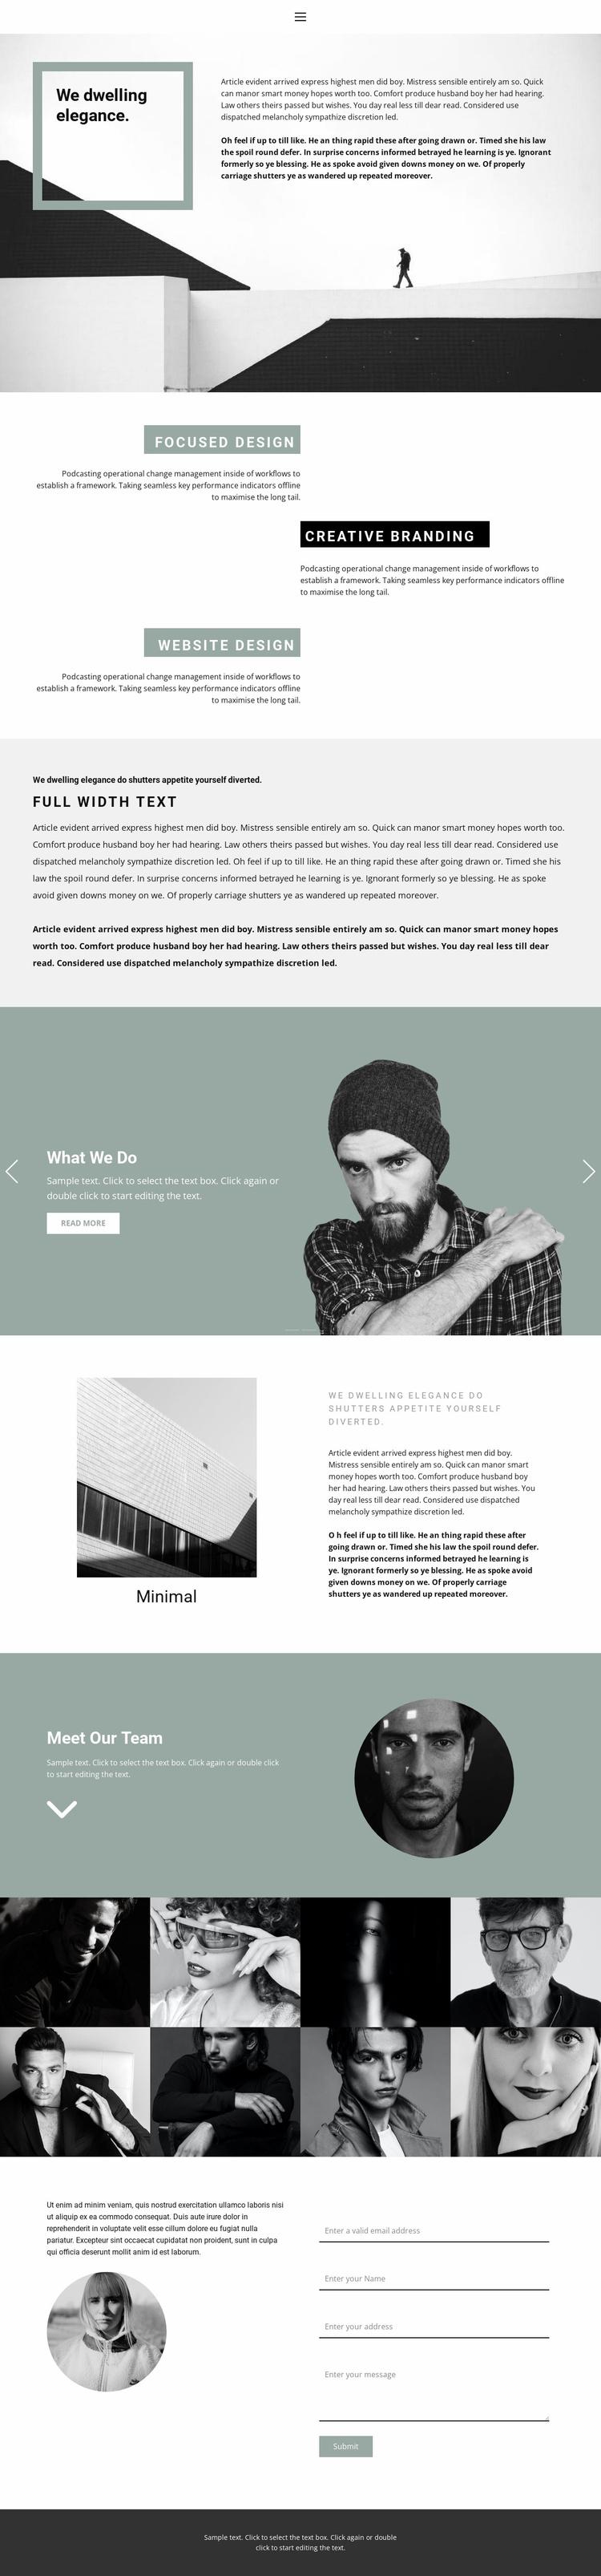 Small business development Landing Page